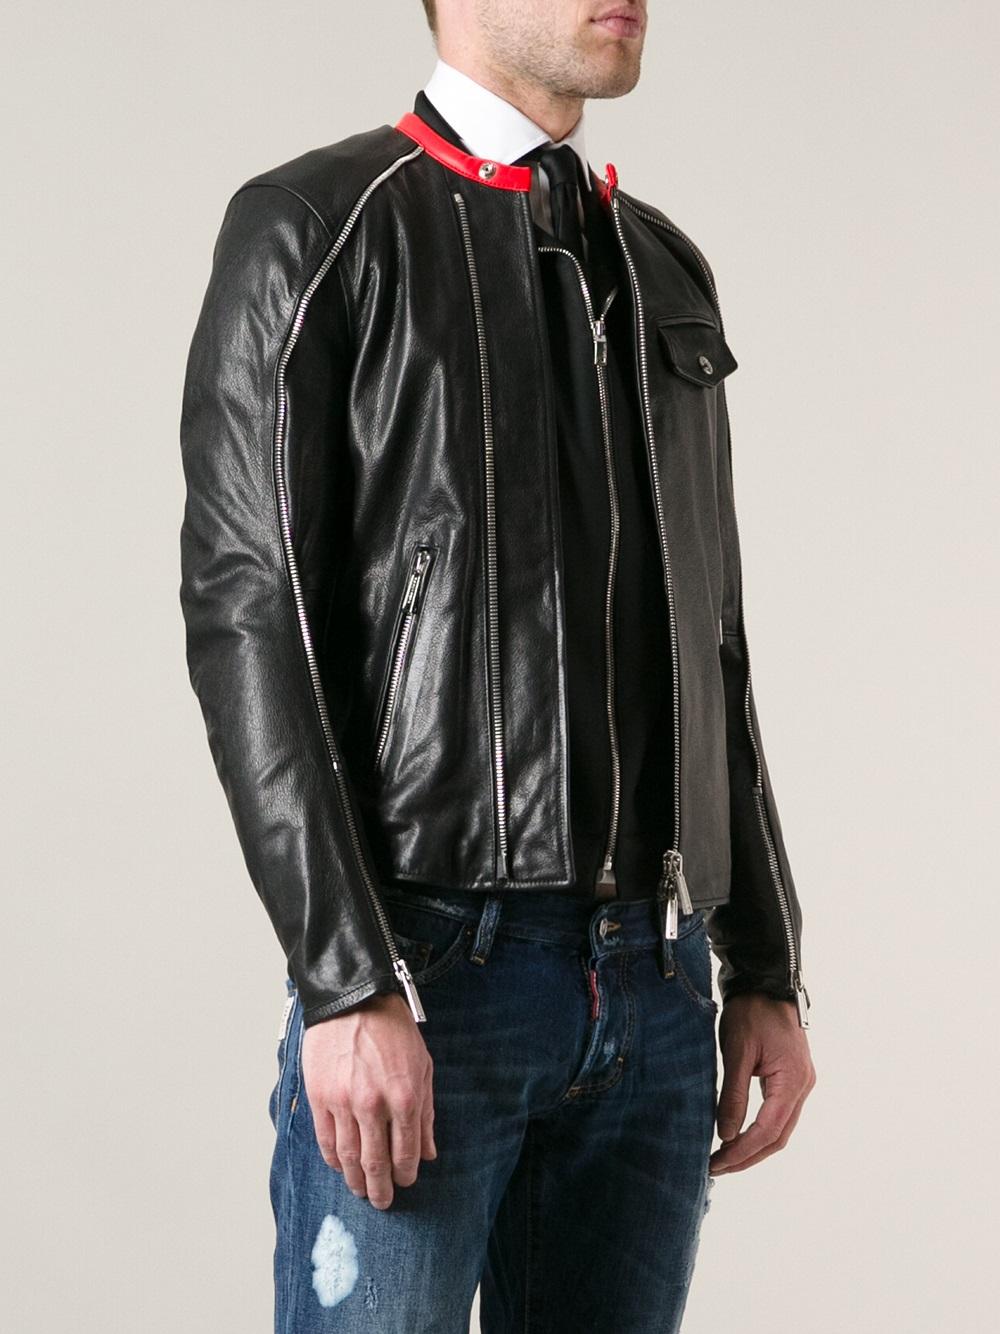 DSquared² Leather Jacket in Black for Men